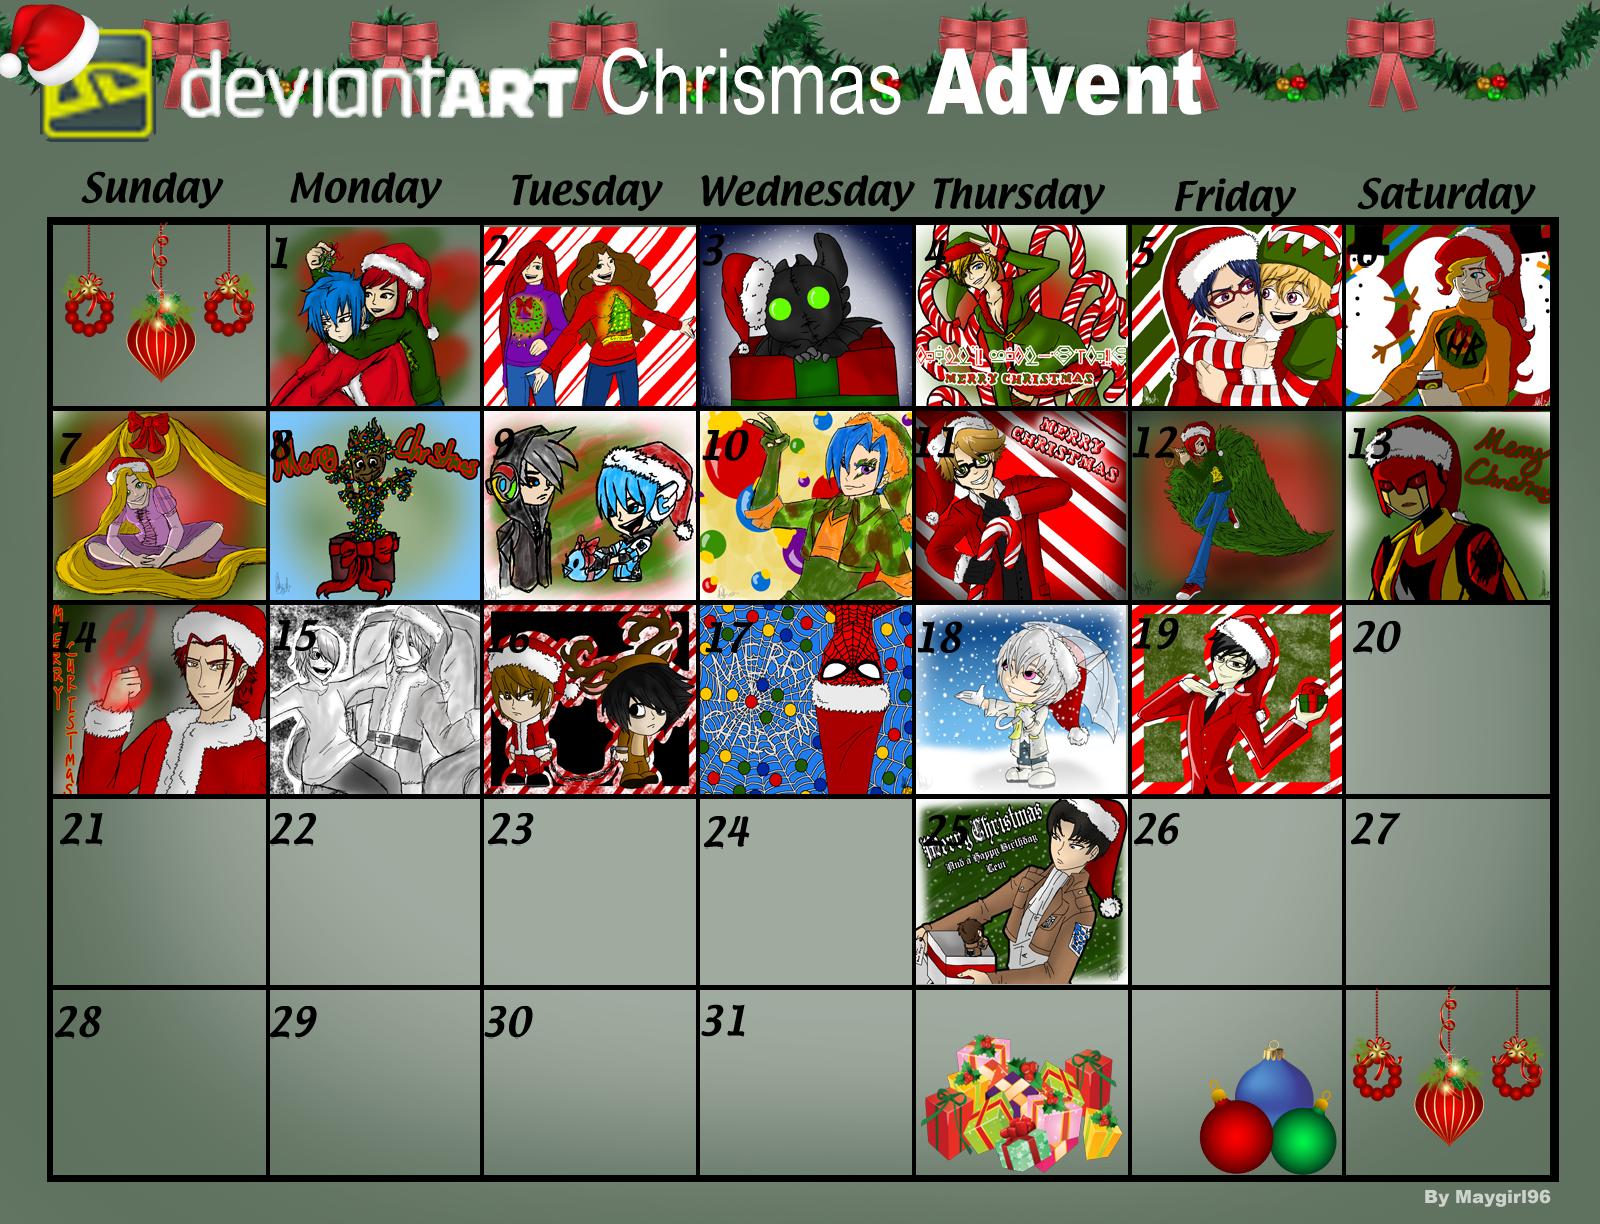 Deviantart Calendar : Deviantart christmas advent calendar by maygirl on